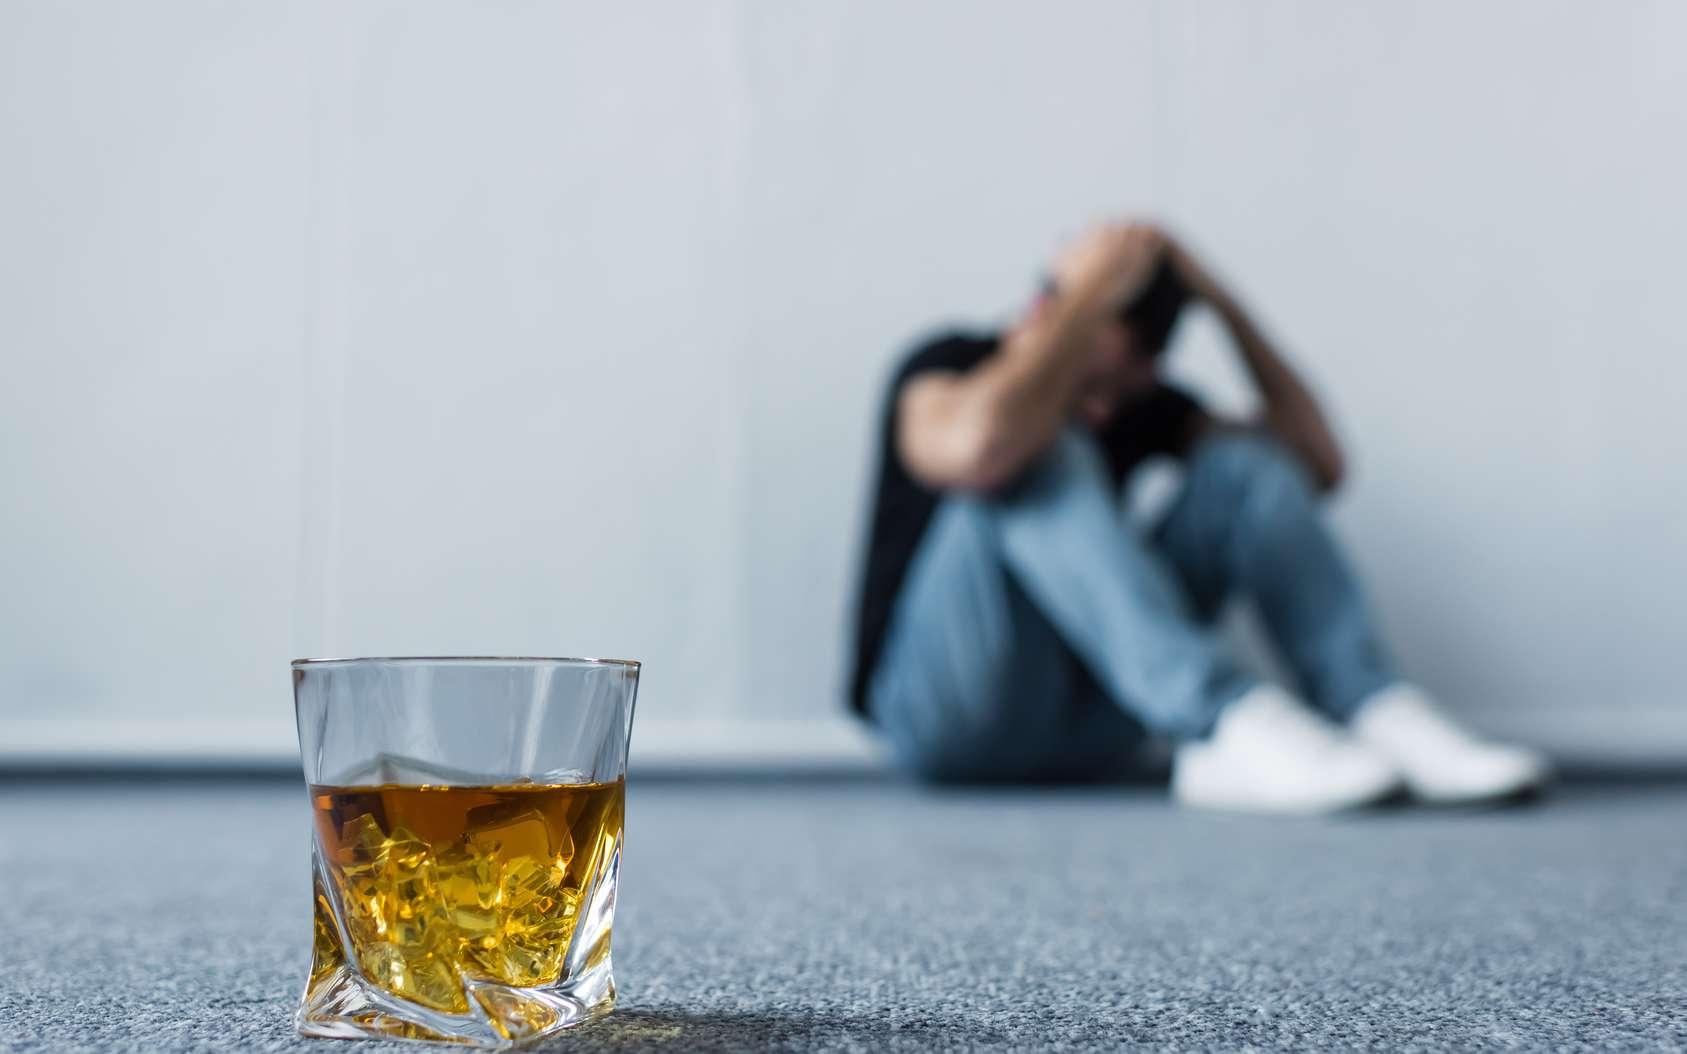 Un arrêt brutal de l'alcool peu entraîner des graves symptômes de sevrage. © Lightfield Studio, Fotolia